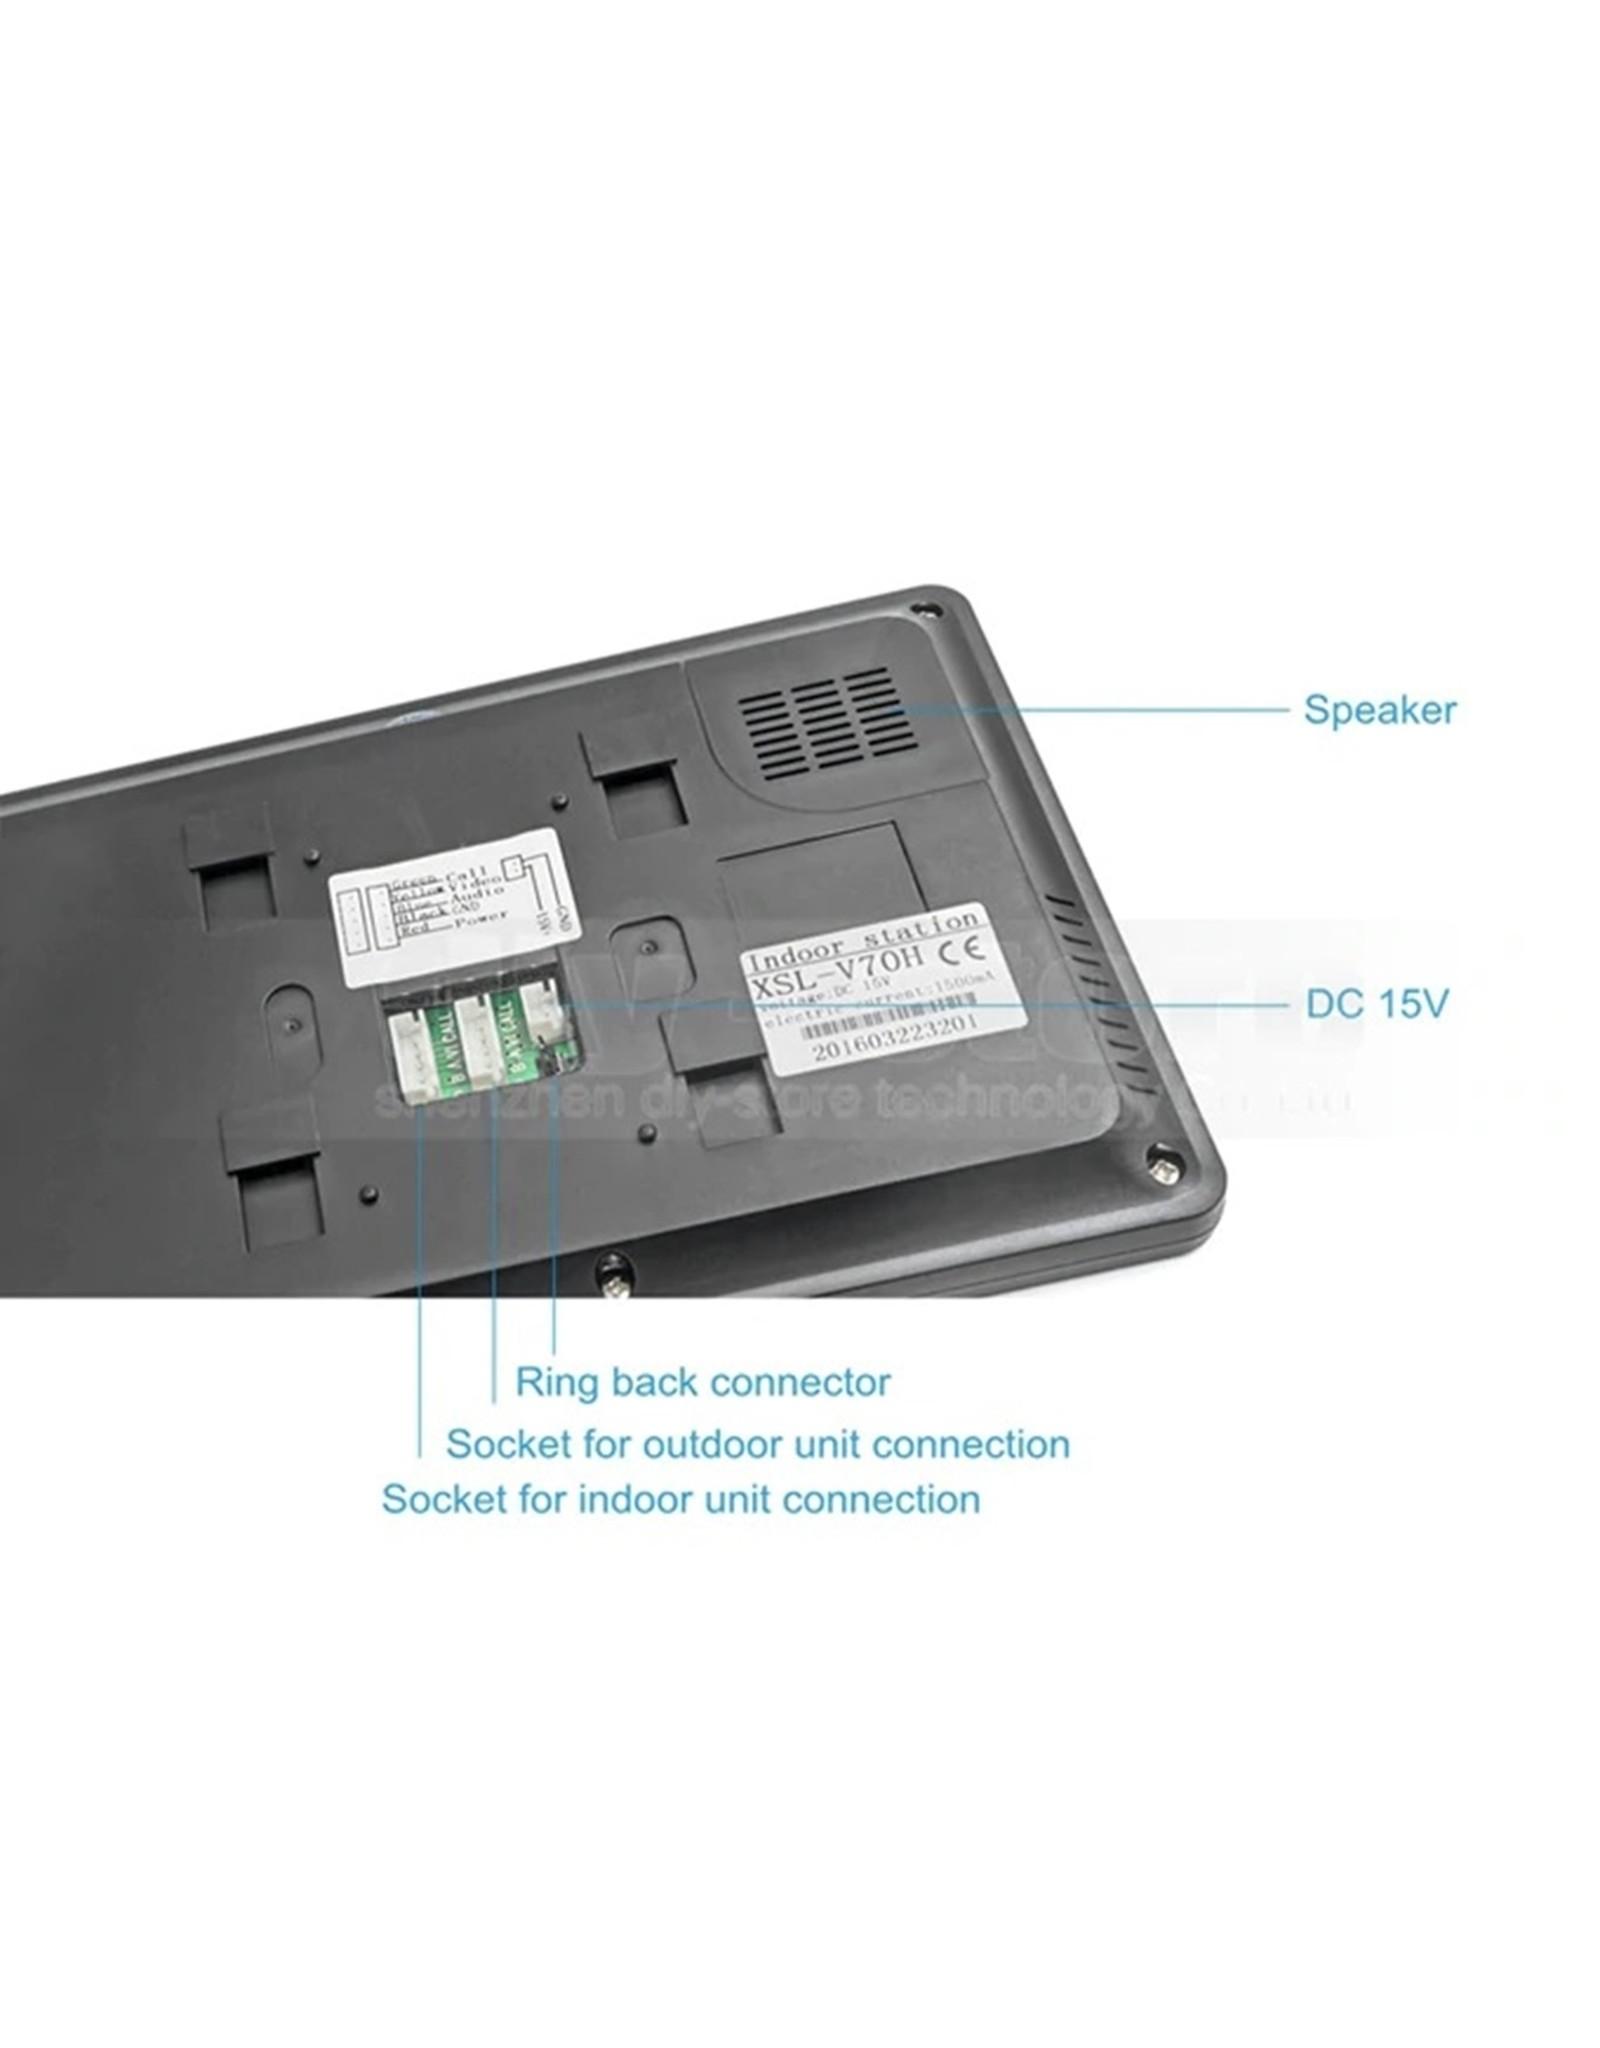 7 inch kleurenmonitor - Deurbel - Intercom met draad Deurintercom